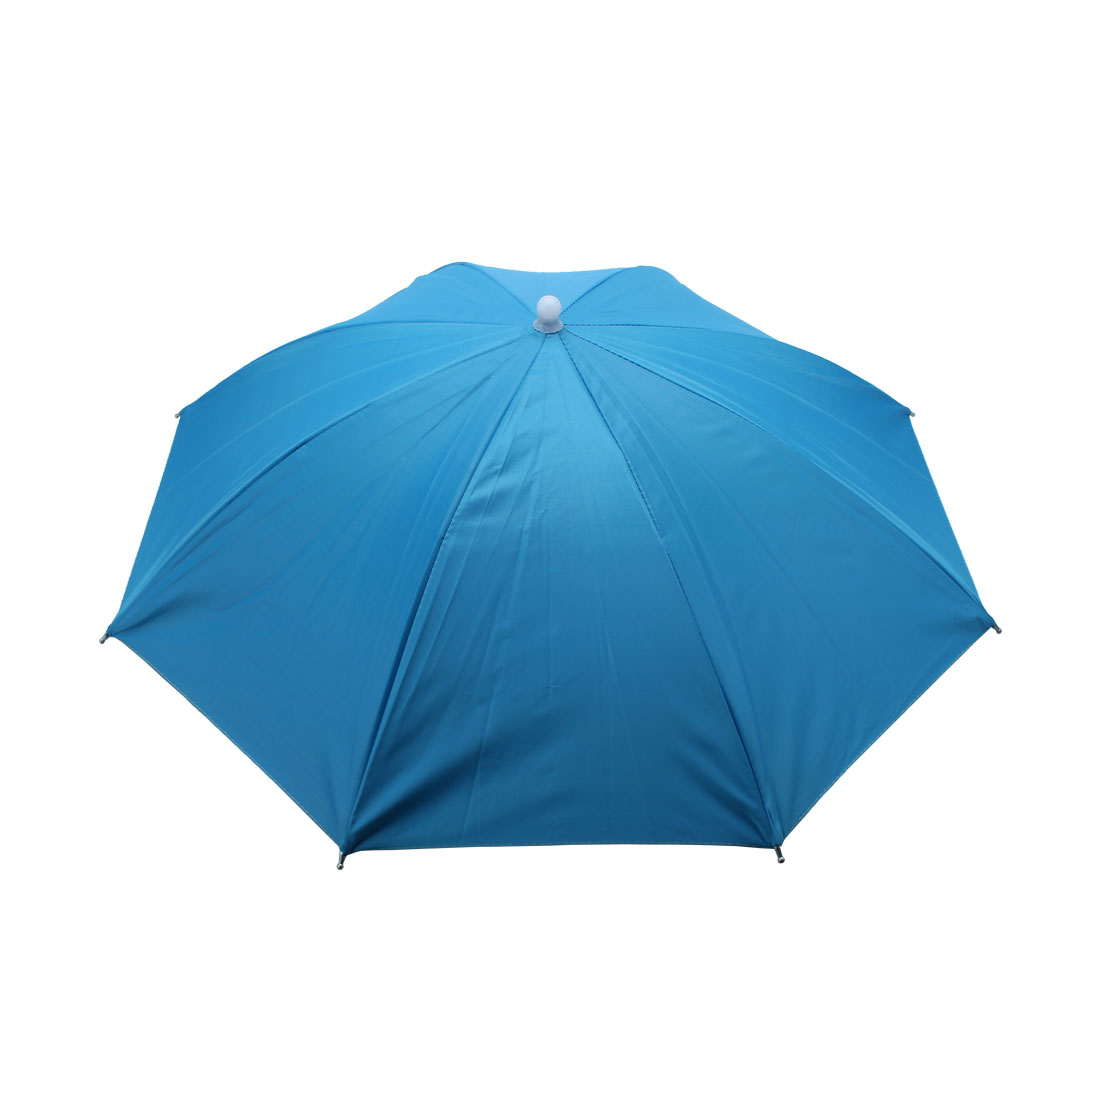 Camping Hiking Beach Elastic Headband Umbrella Hat Headwear Sky Blue